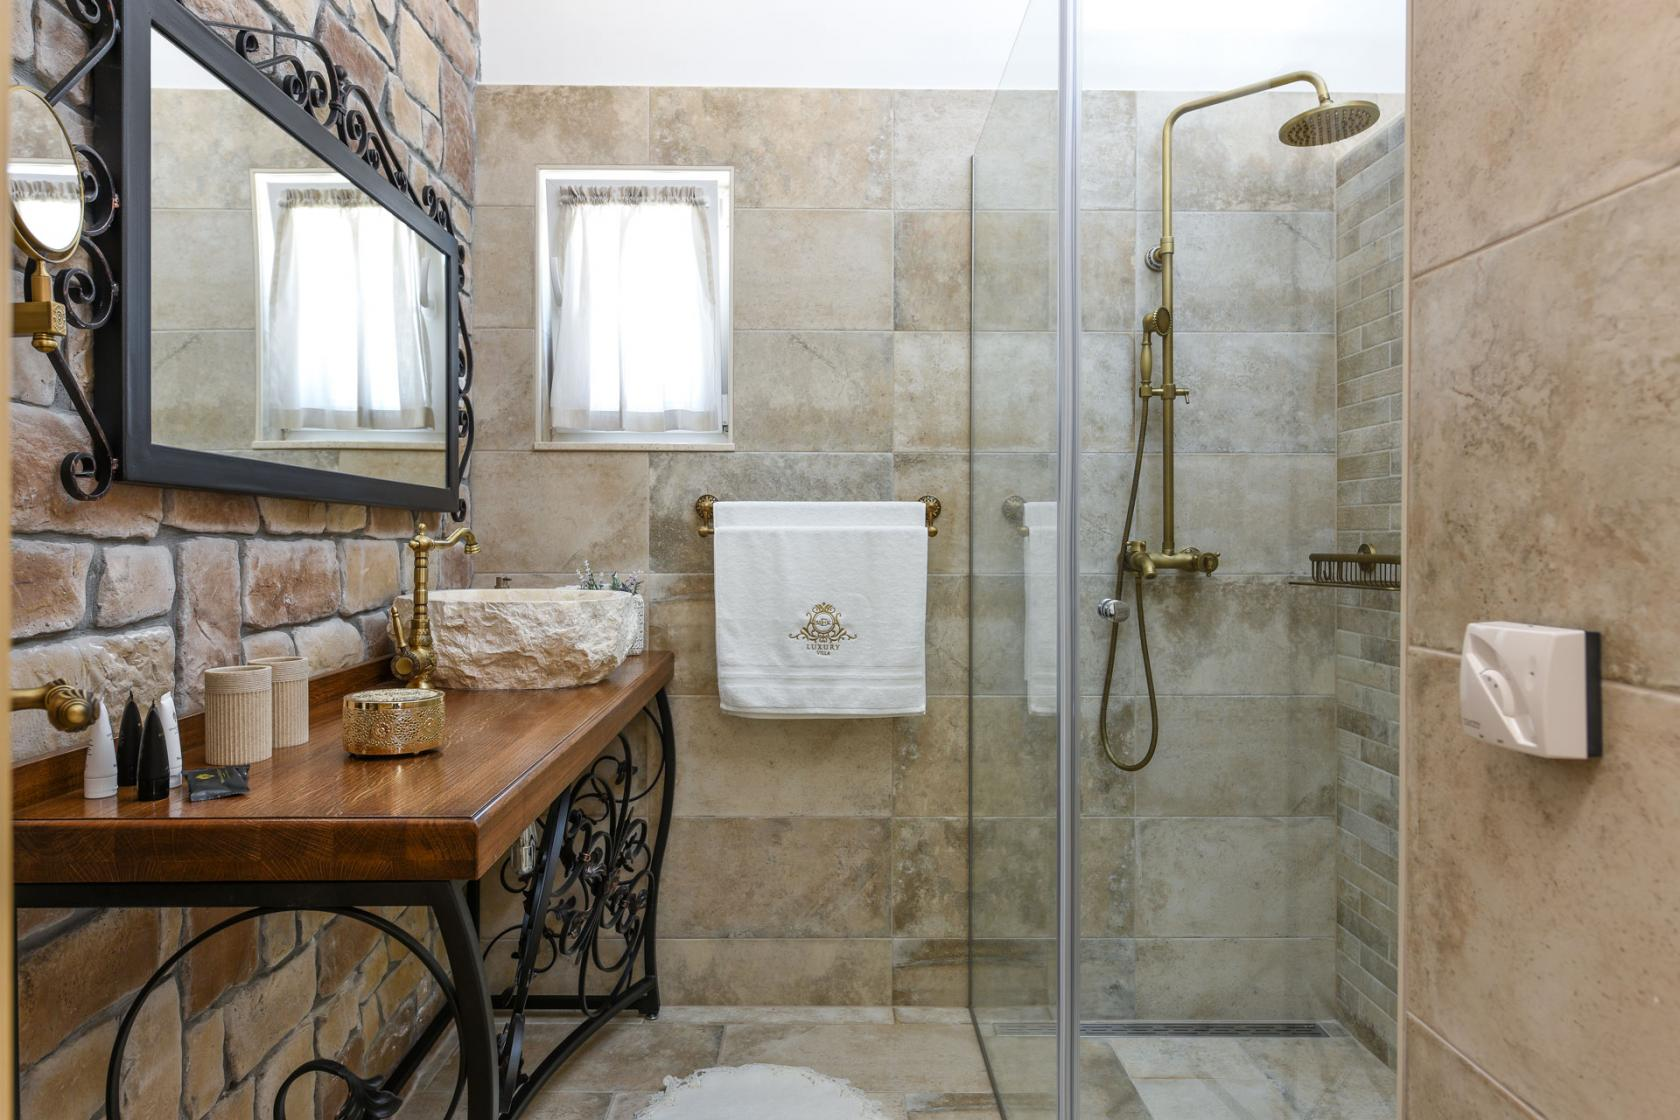 villa, Mek, bathroom, luxury, www.zadarvillas.com